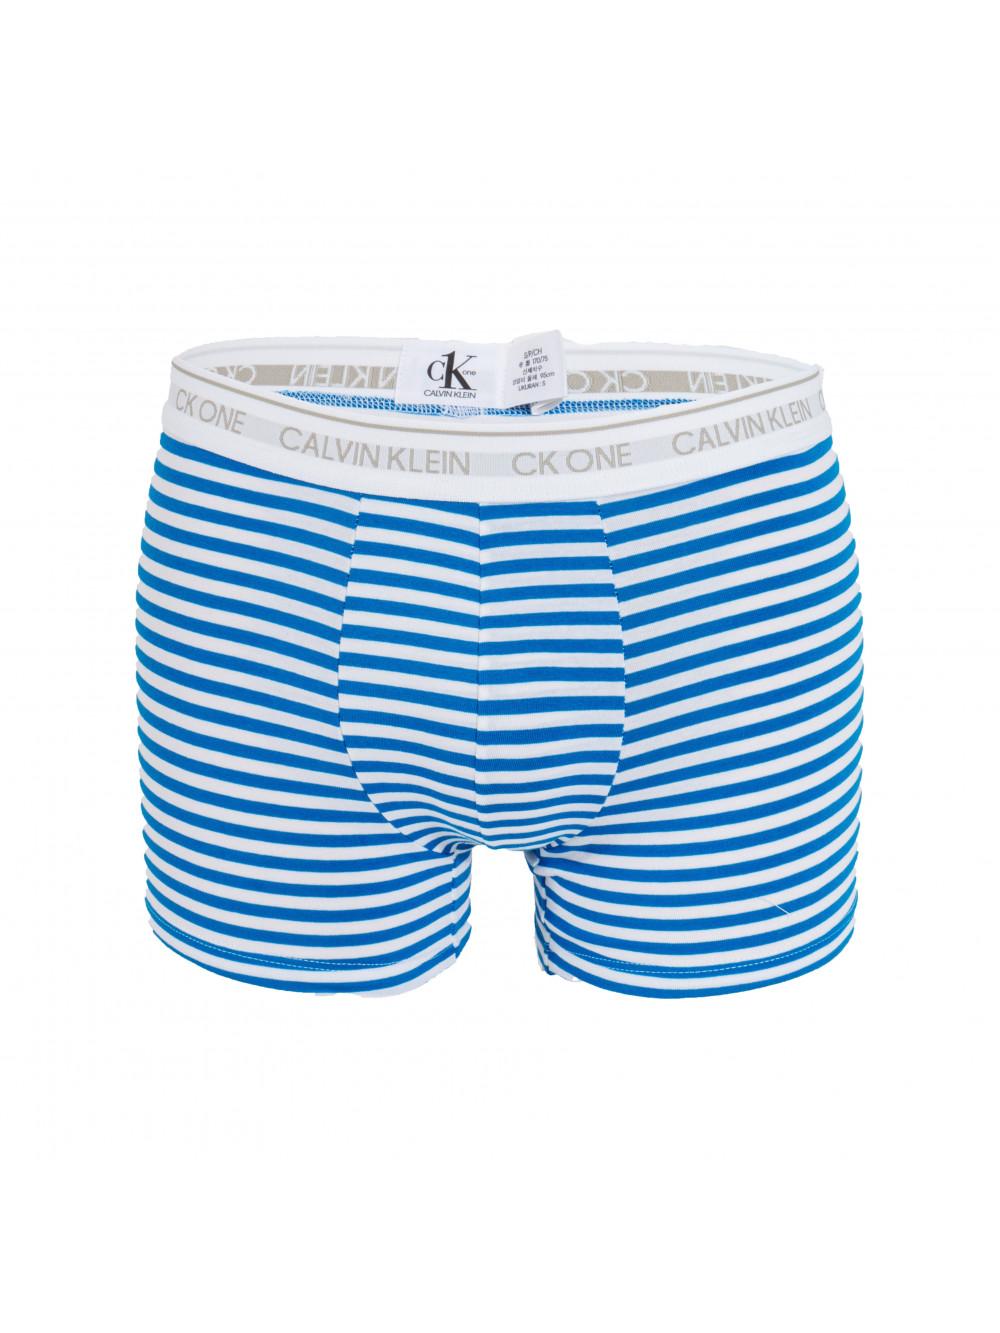 Férfi boxeralsó Calvin Klein CK One Stripes fehér-kék